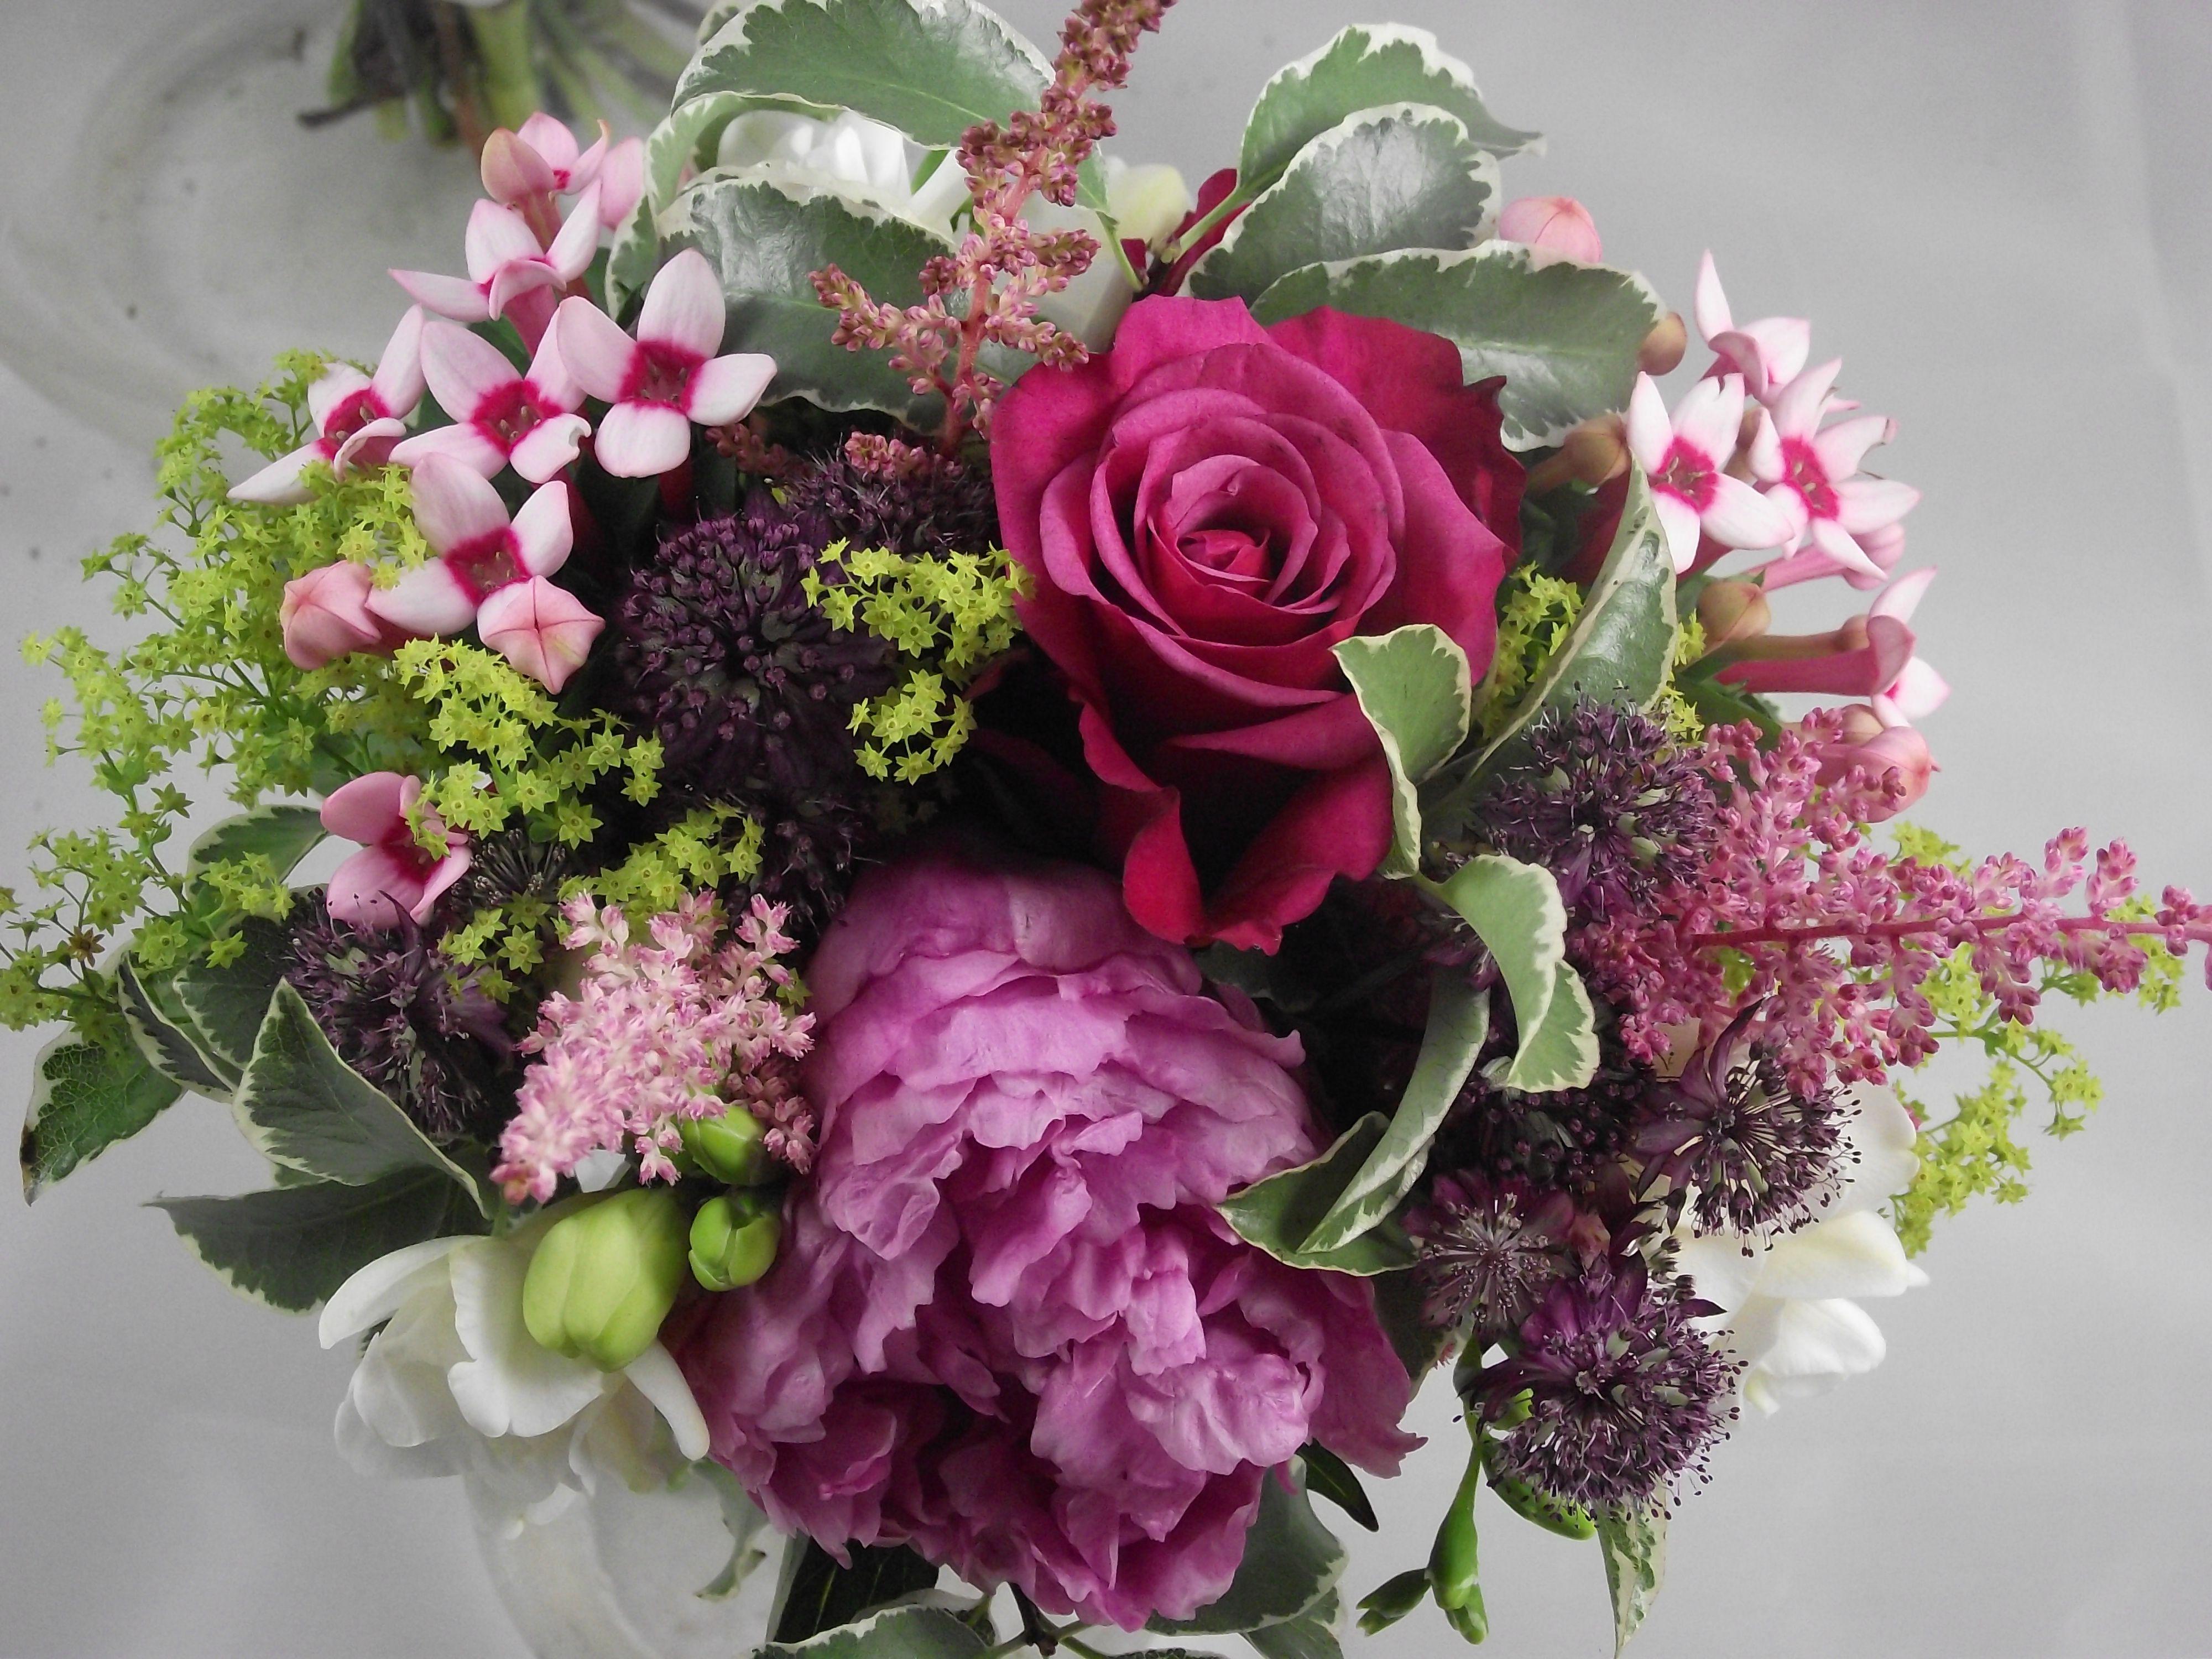 Deep fushia coloured roses, pink peonies, pink bouvardia astrantia ...